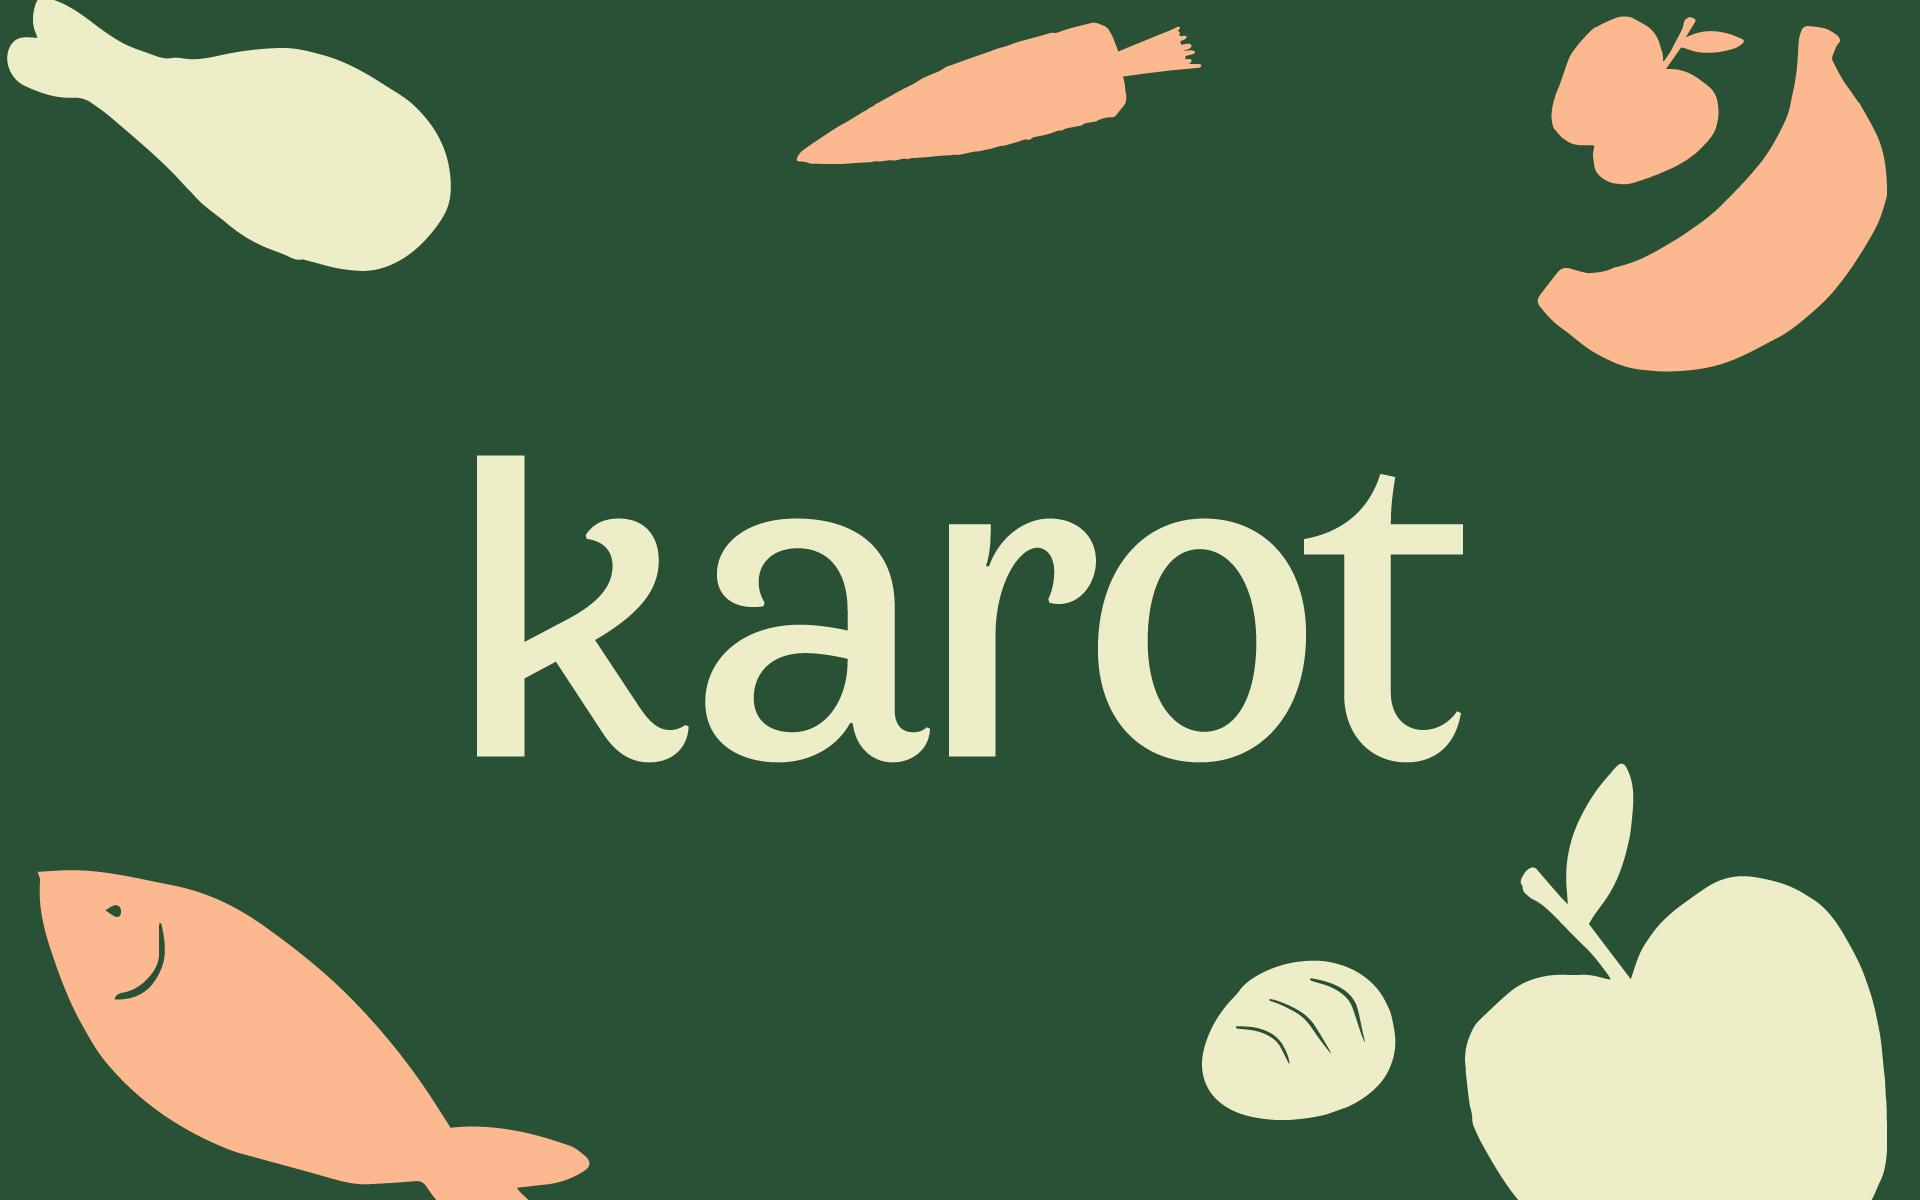 Karot-Brand-Identity-Design-2